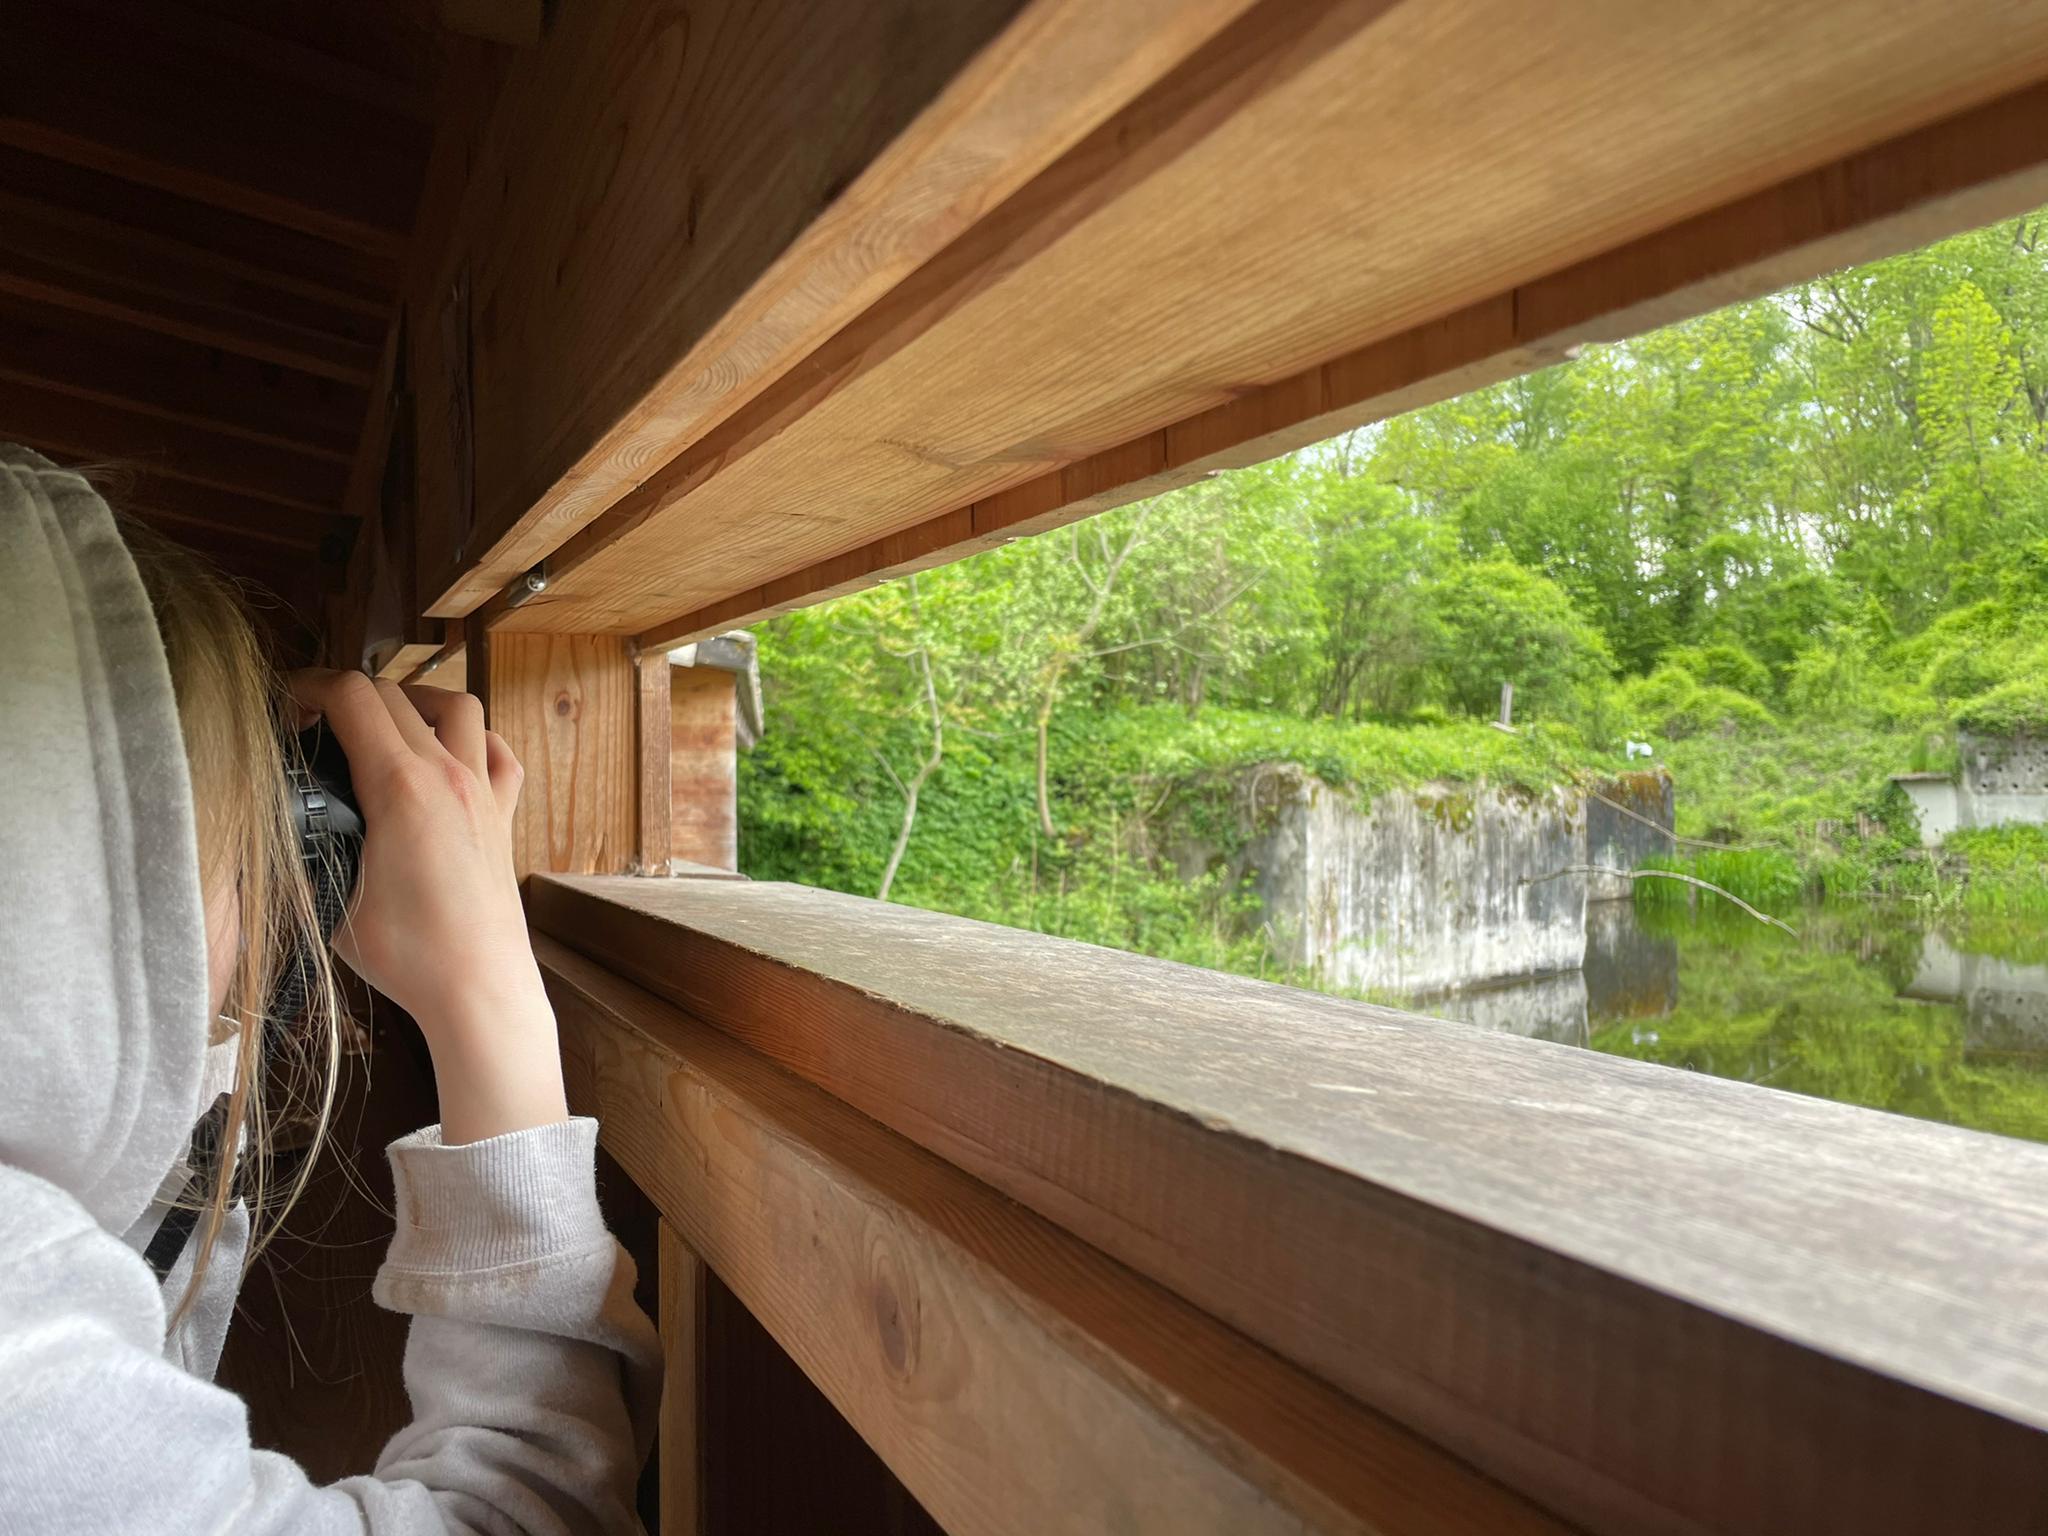 Voyage de la famille Cavadini: le centre-nature BirdLife de la Sauge